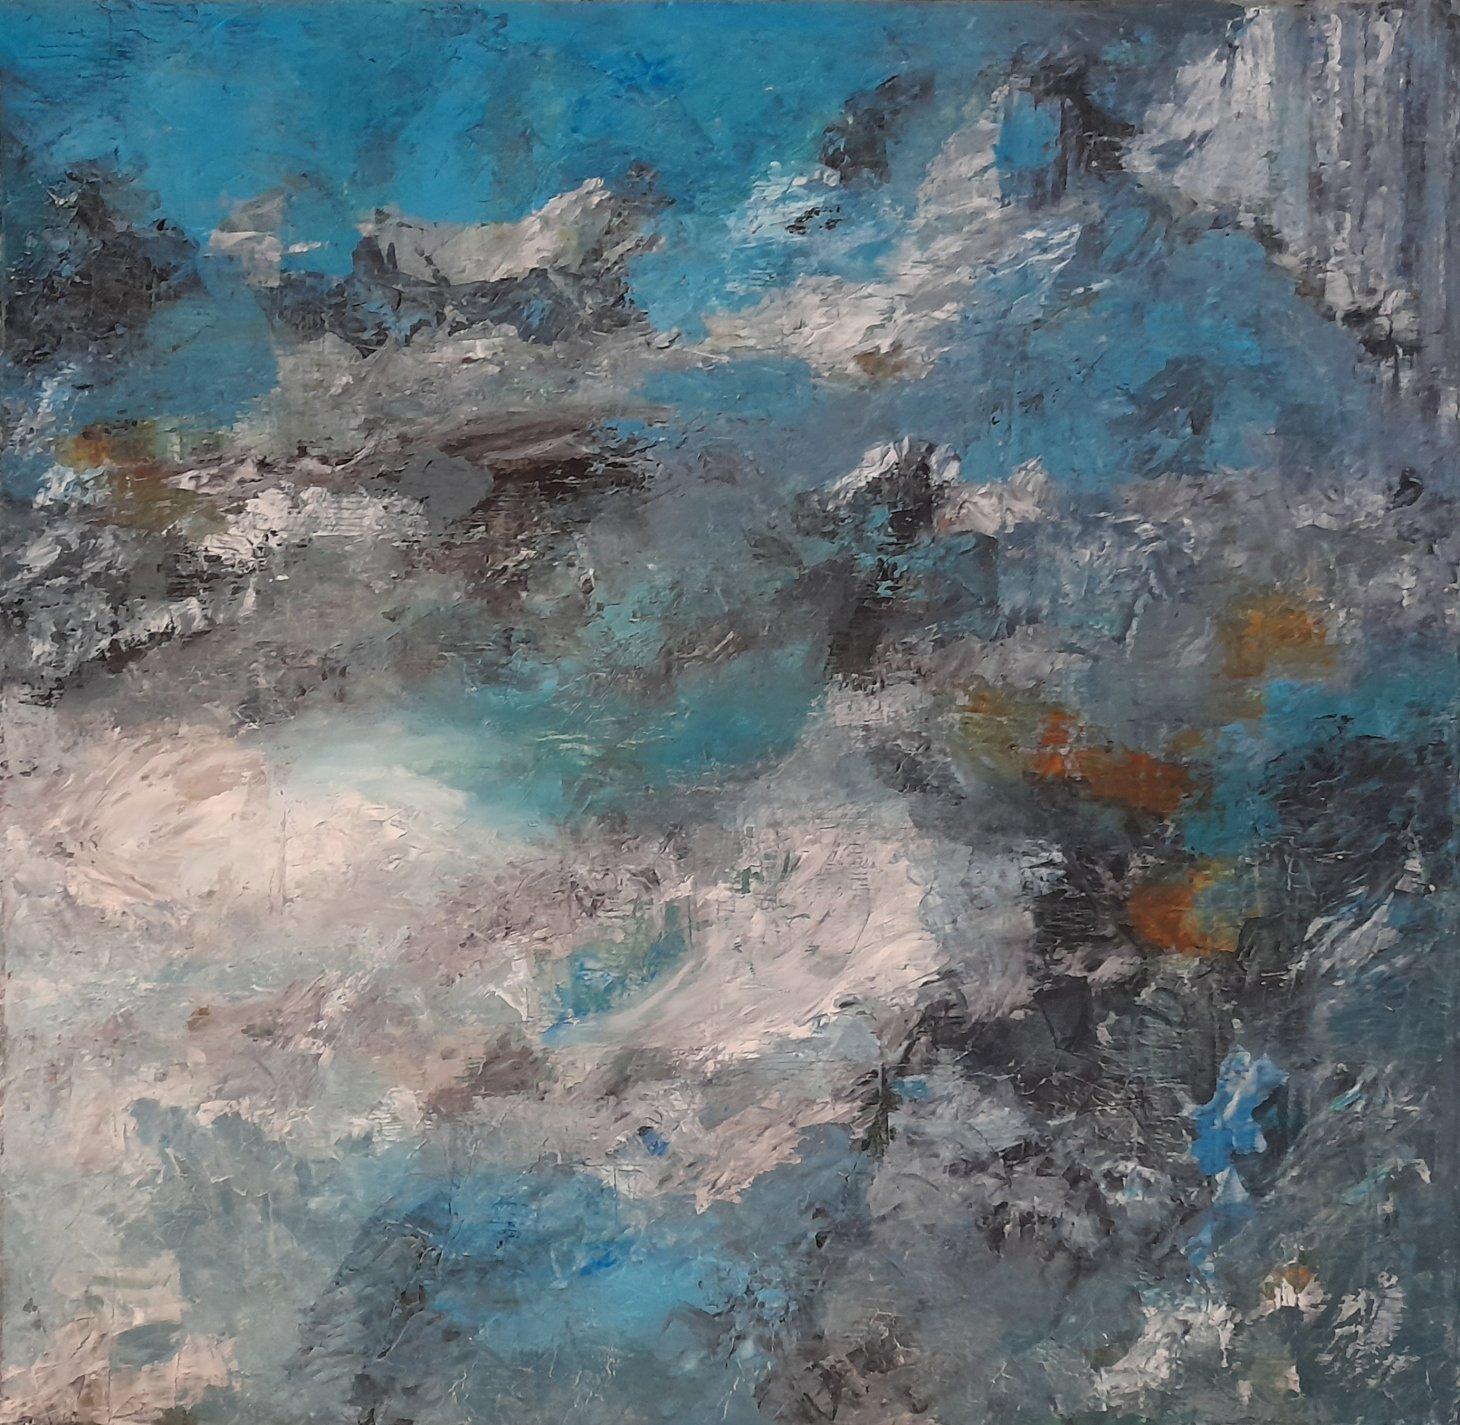 Buy Cornish Art Darren Paul Clark The Eye Of The Storm